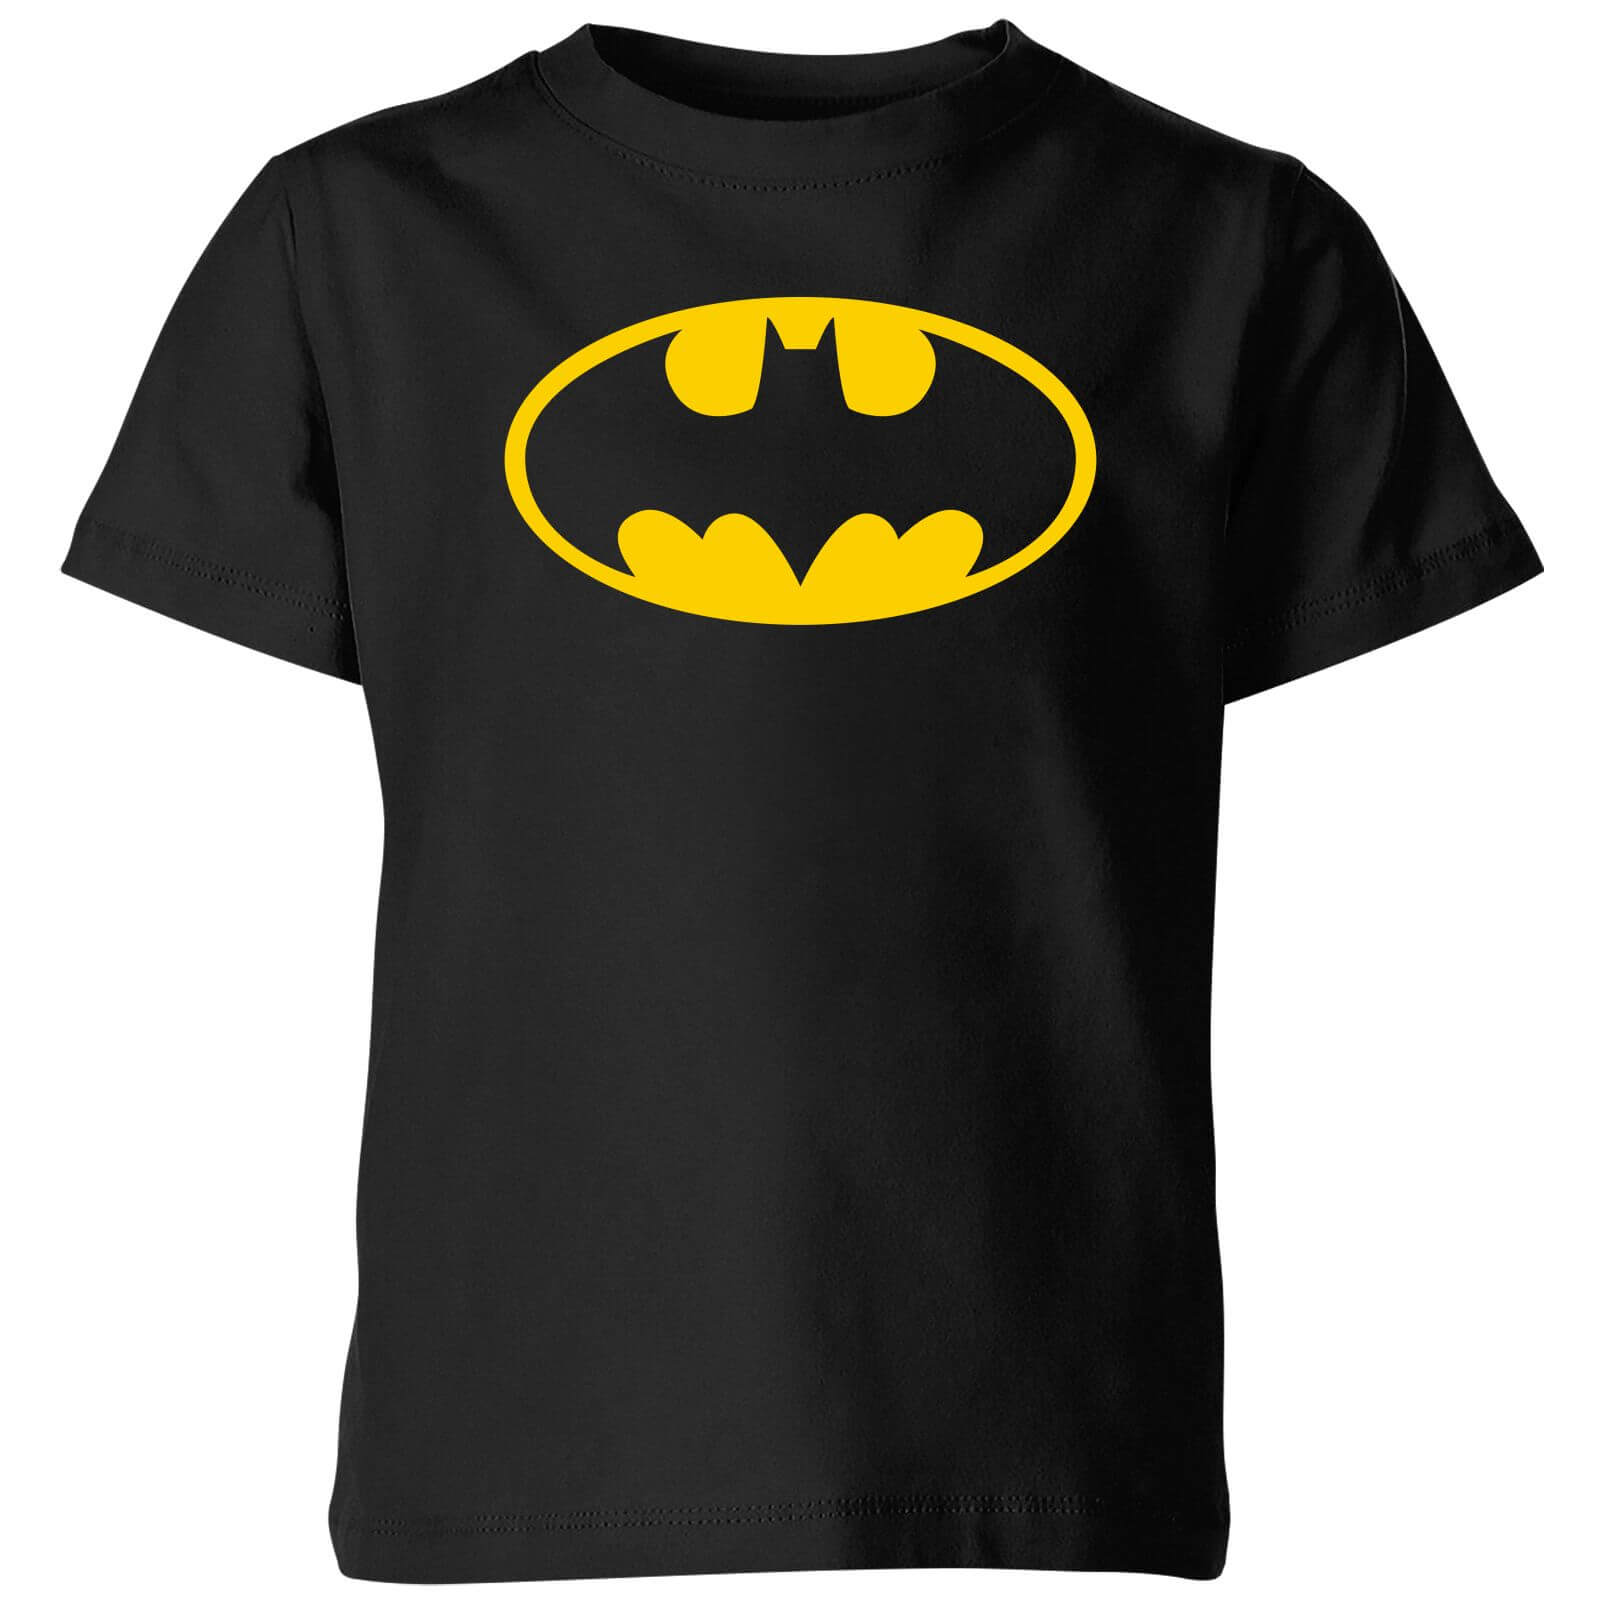 Justice League Batman Logo Kids T Shirt   Black   3 4 Years   Black